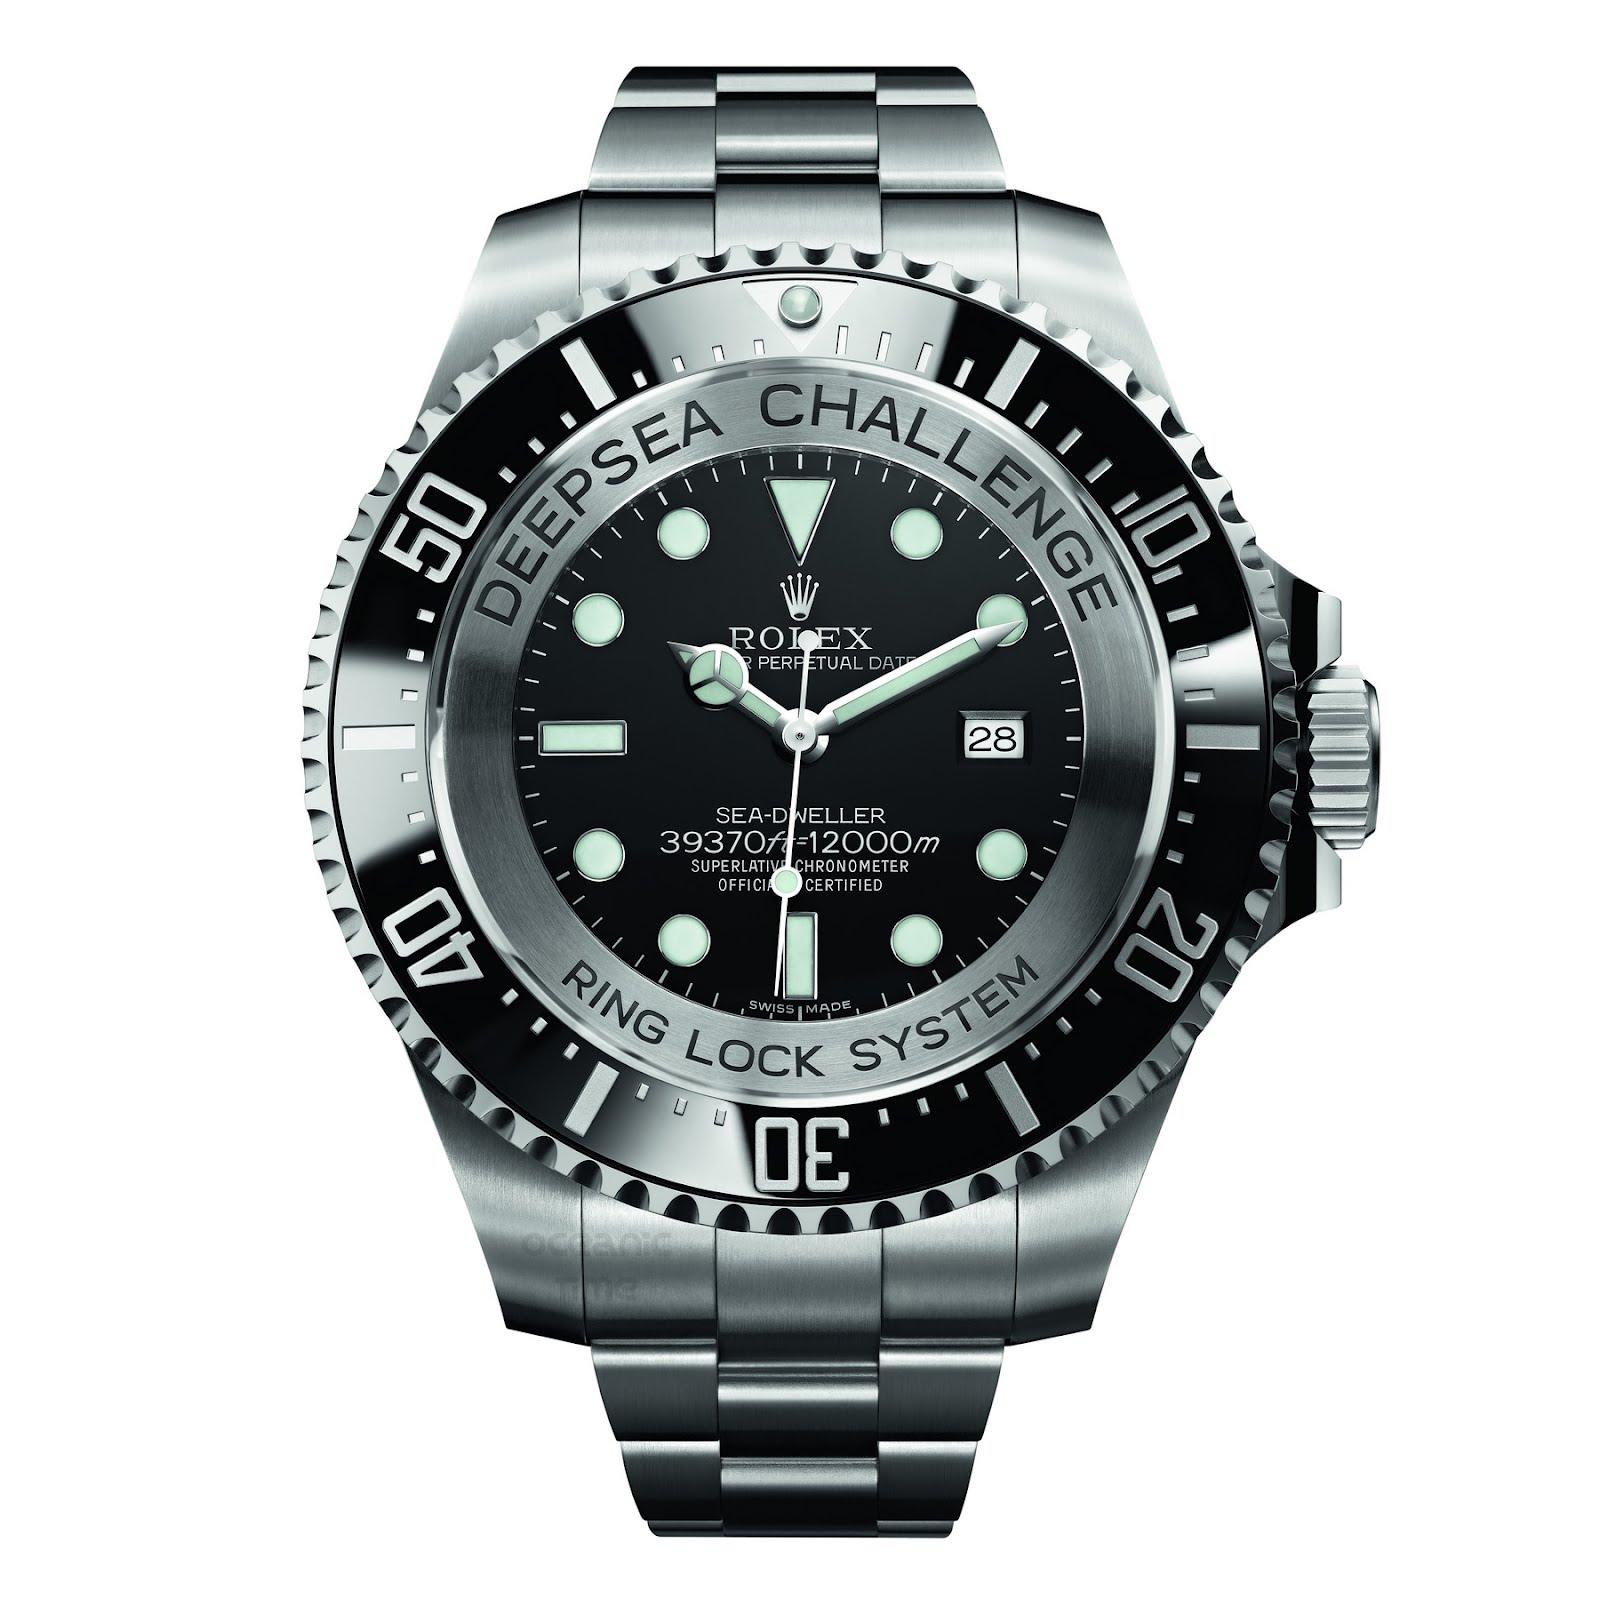 sea watch - photo #41